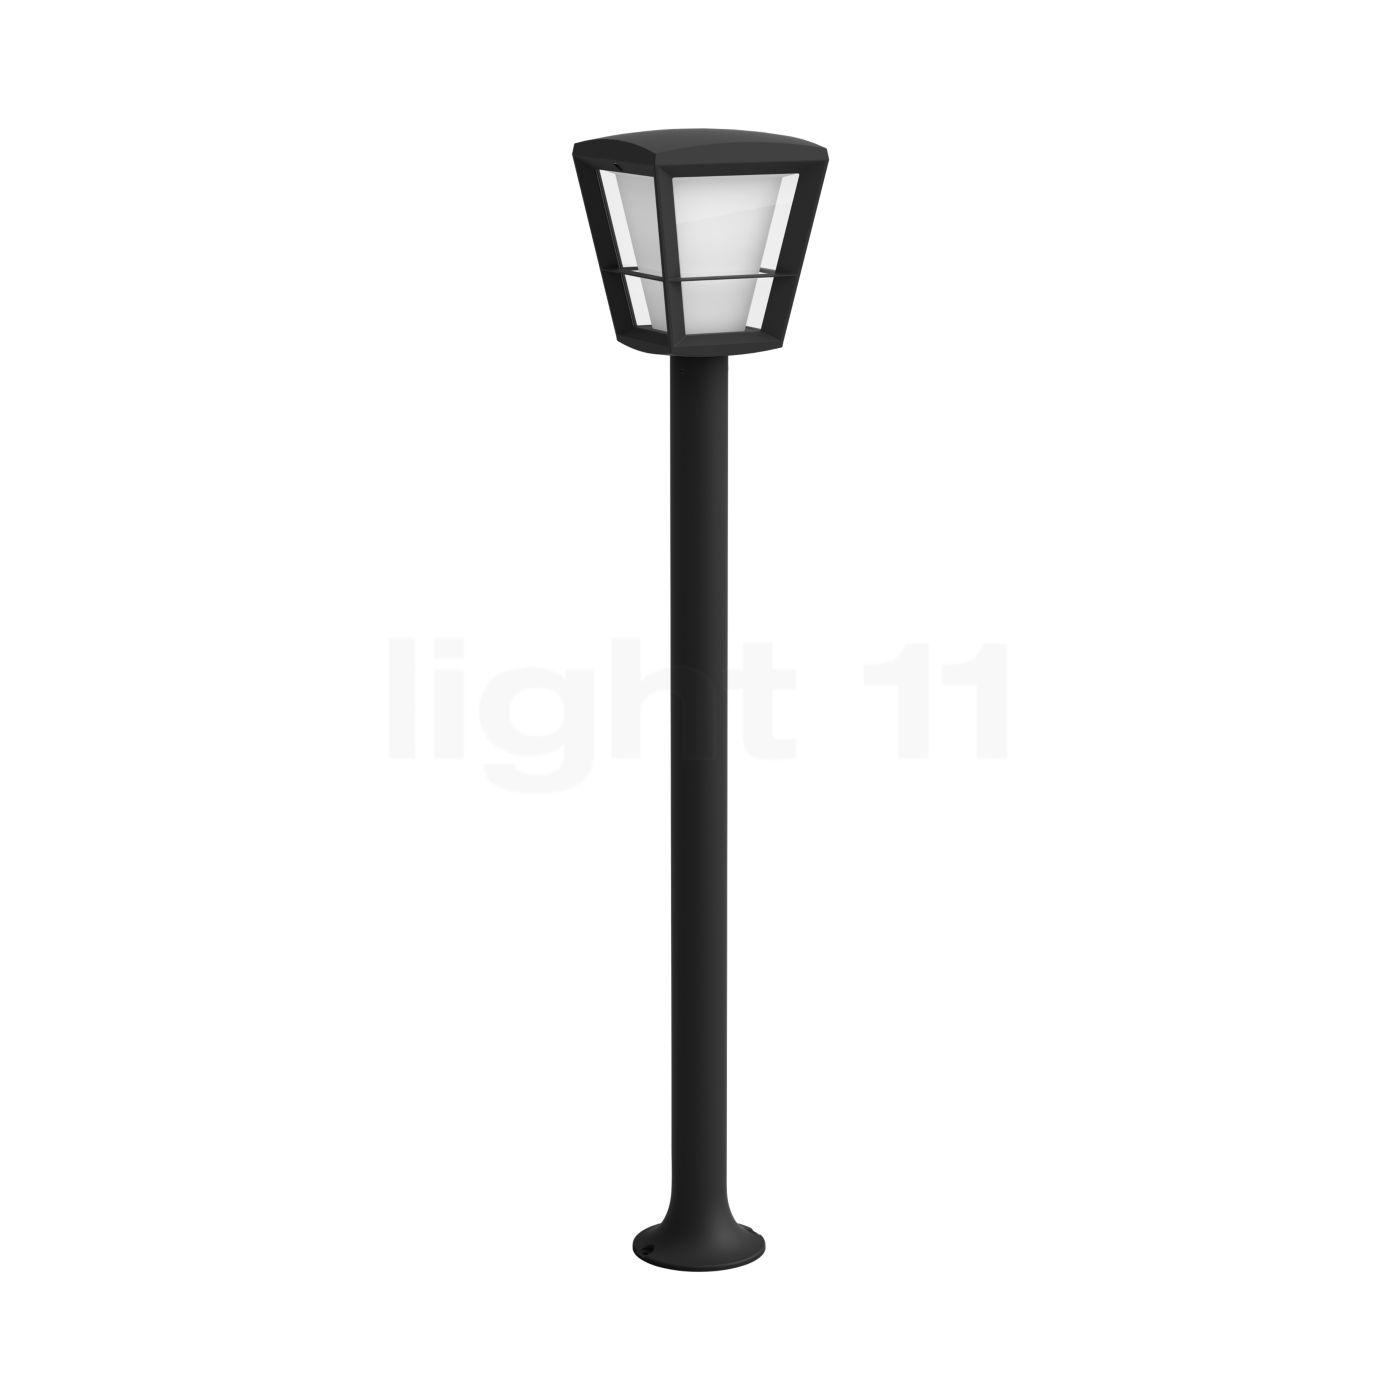 Philips Hue Econic Wegeleuchte LED, schwarz 1744230P7